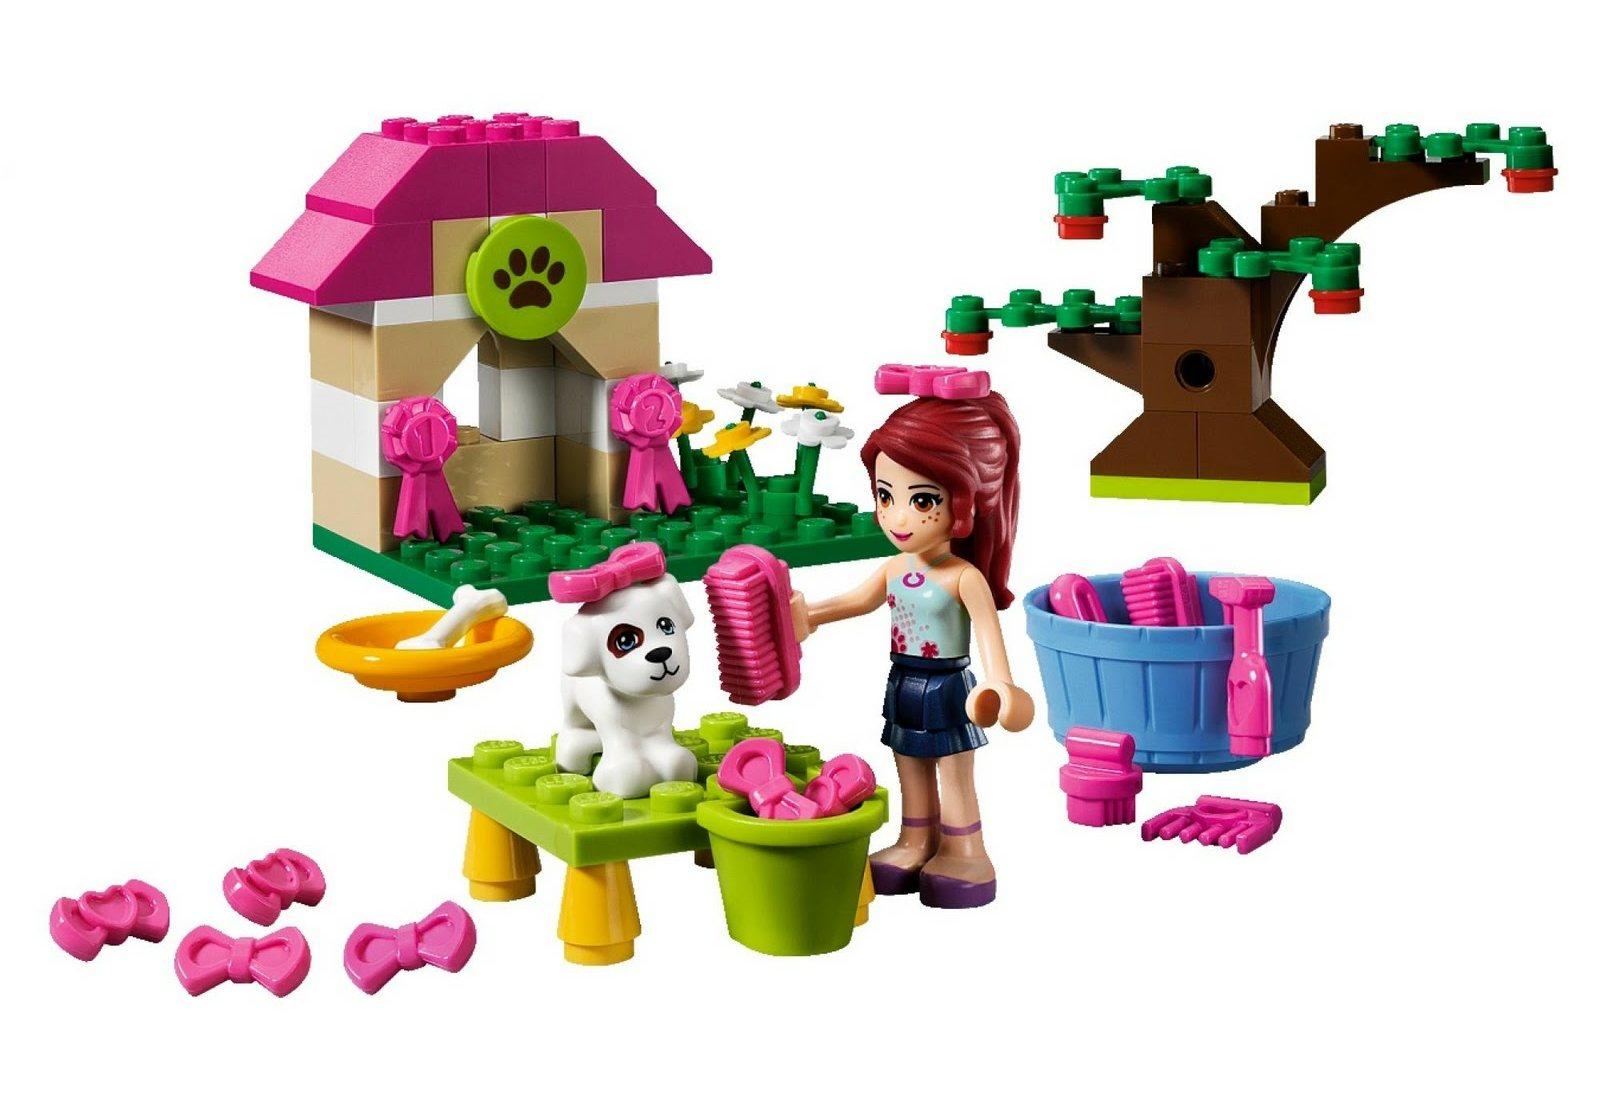 Brick Friends: LEGO 3934 Mia's Puppy House